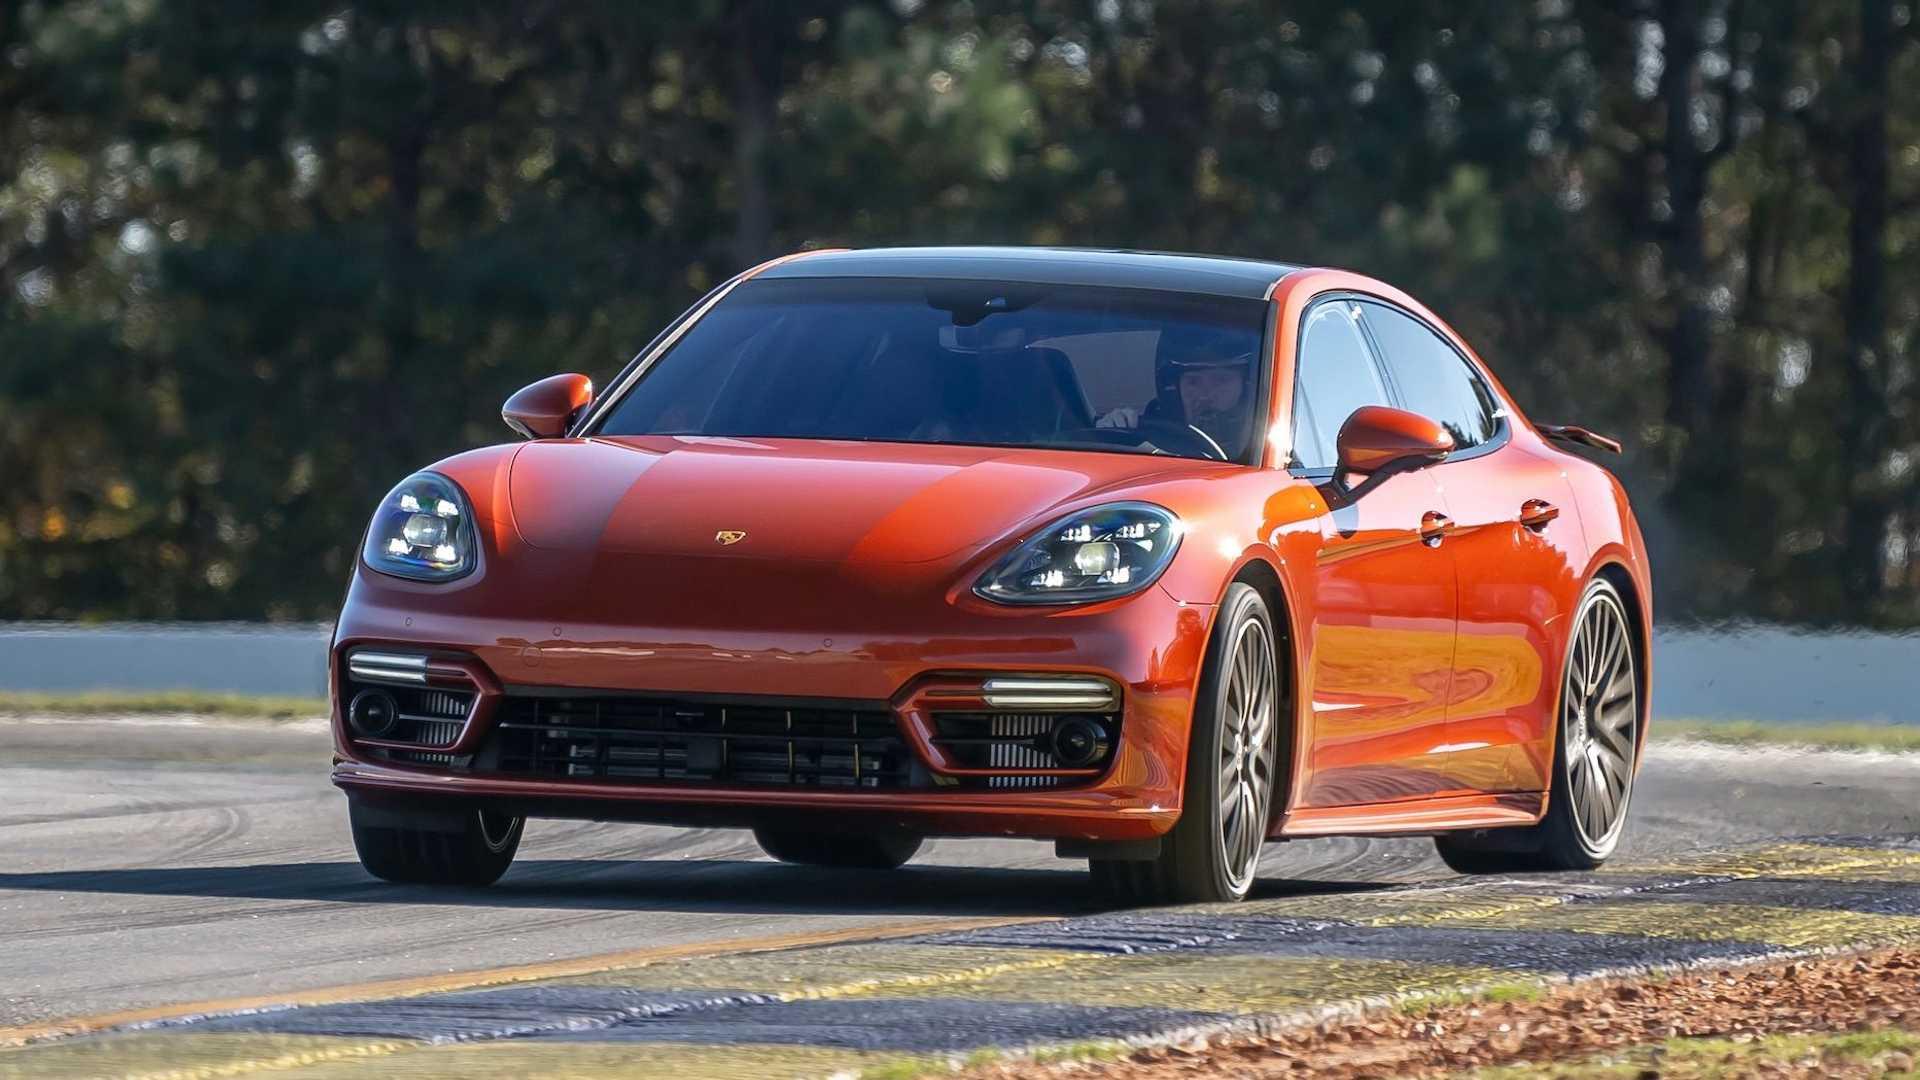 Porsche-Panamera-Turbo-Record-Road-Atlanta-1